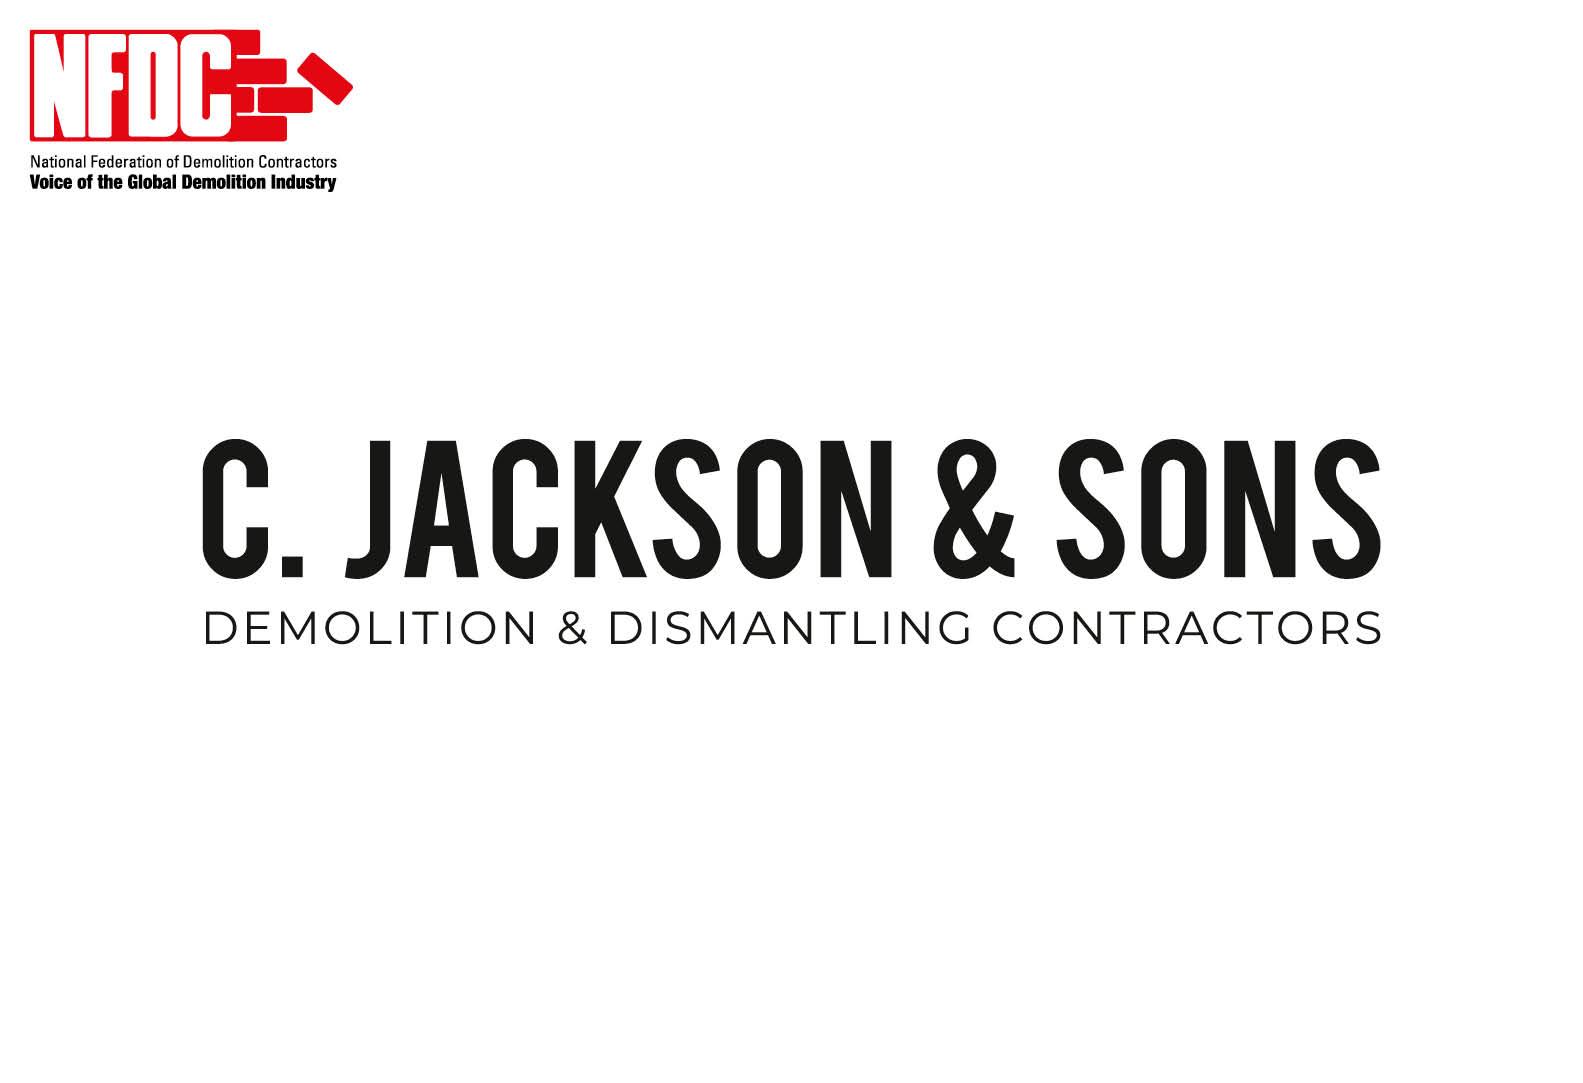 C Jackson Sons